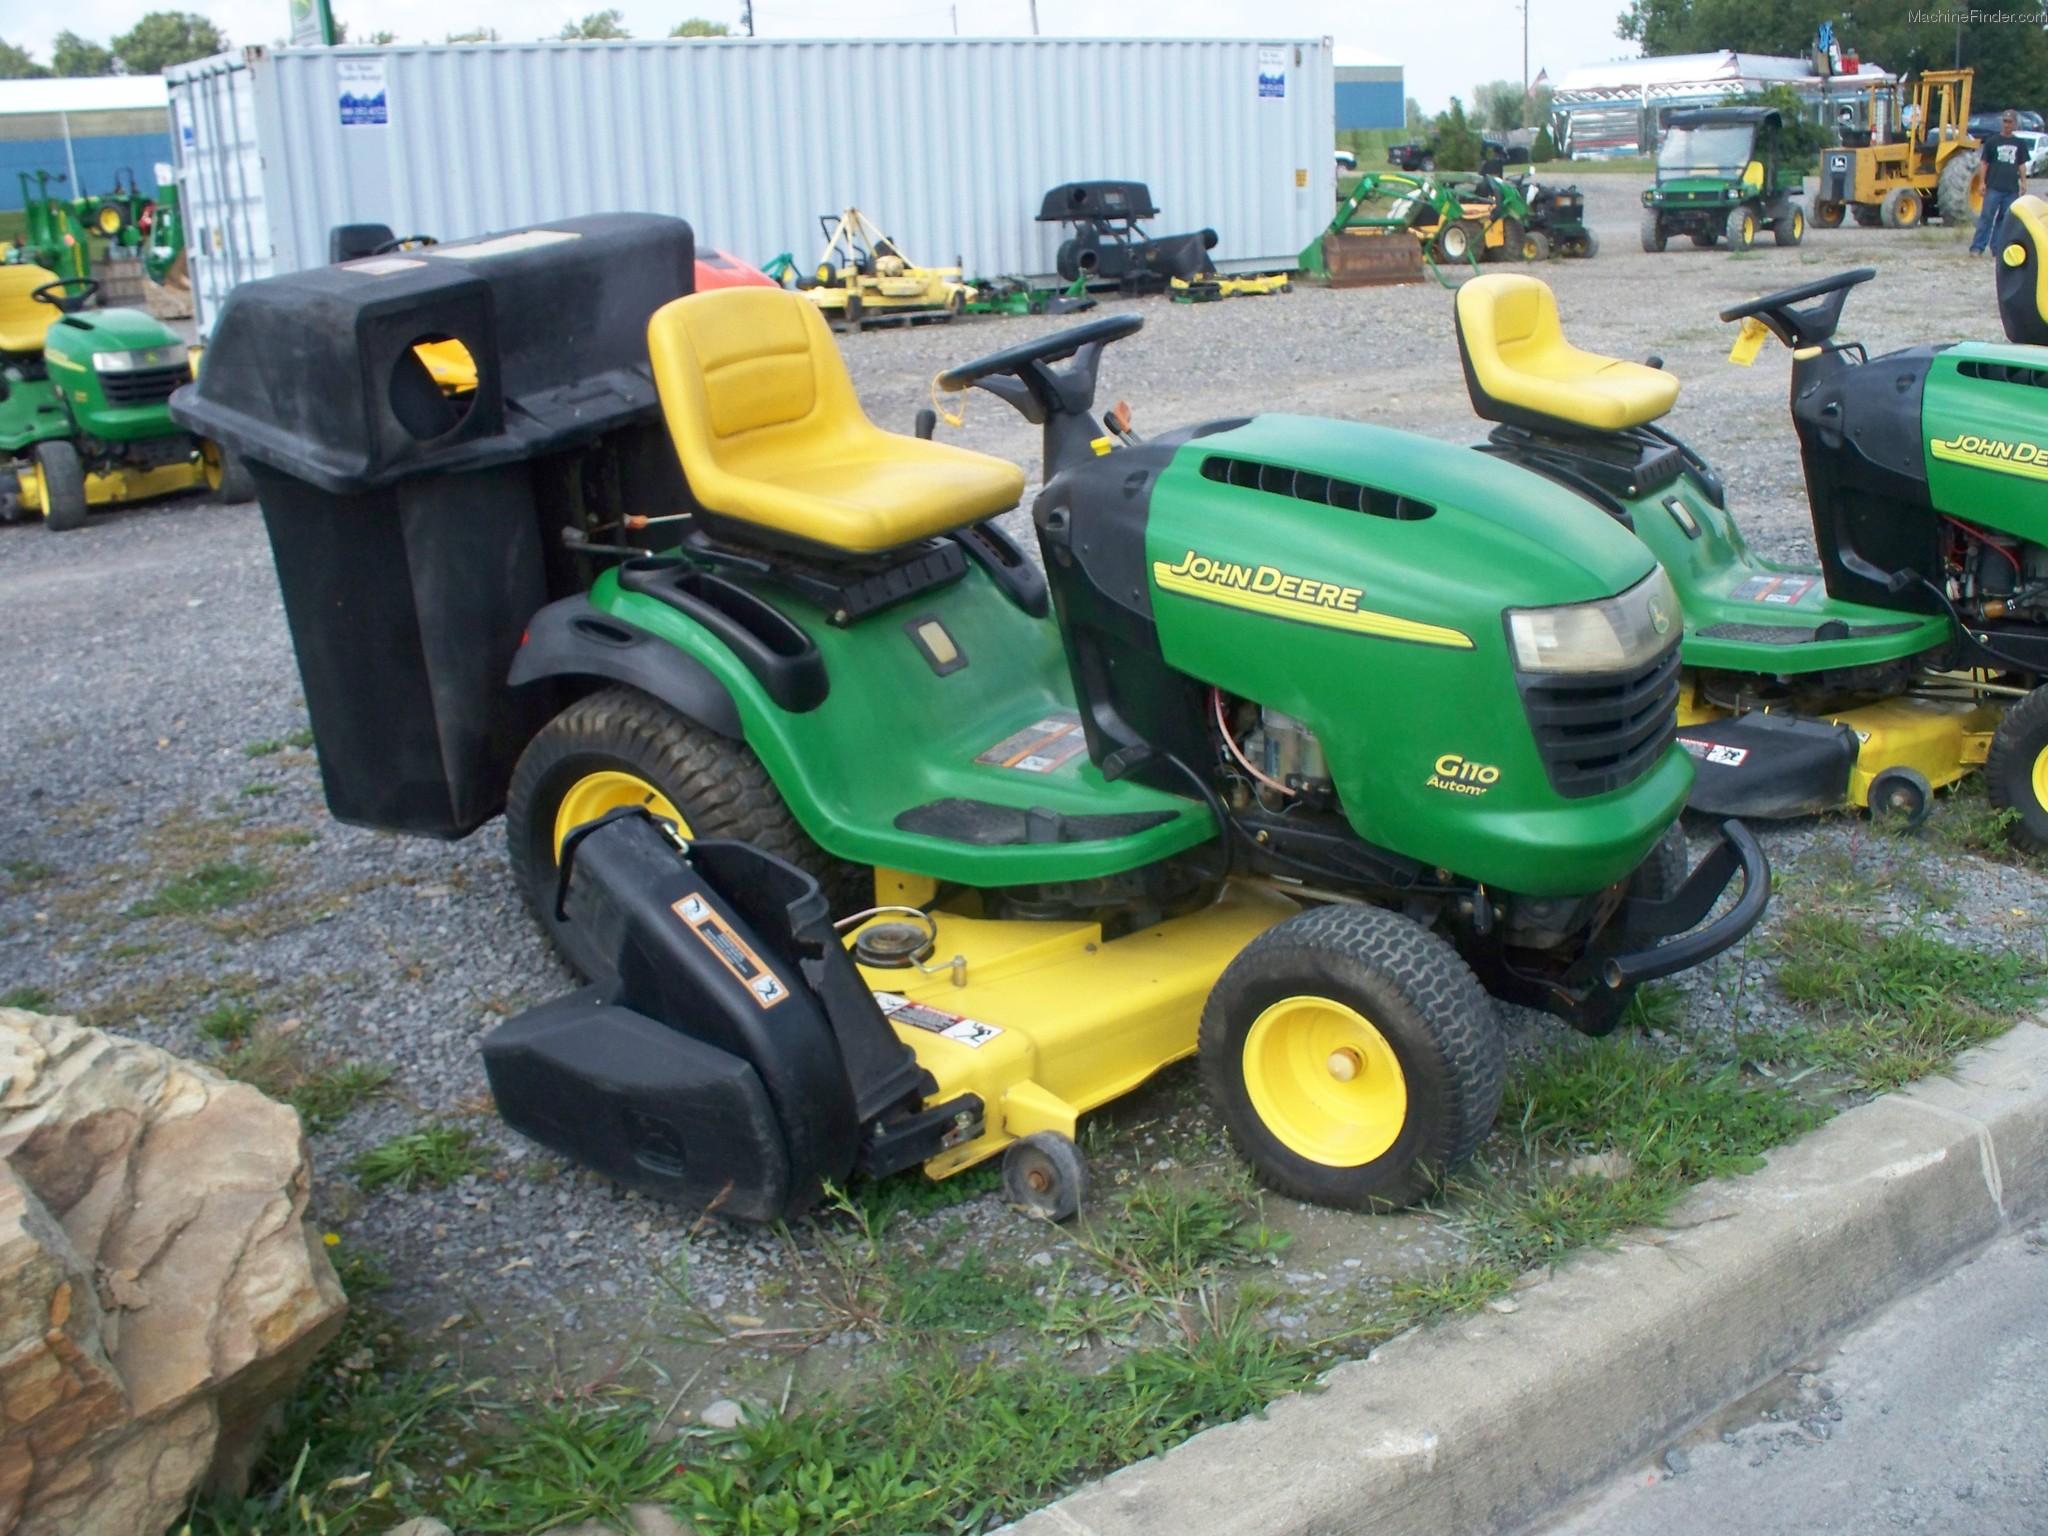 2004 John Deere G110 Lawn & Garden and Commercial Mowing .